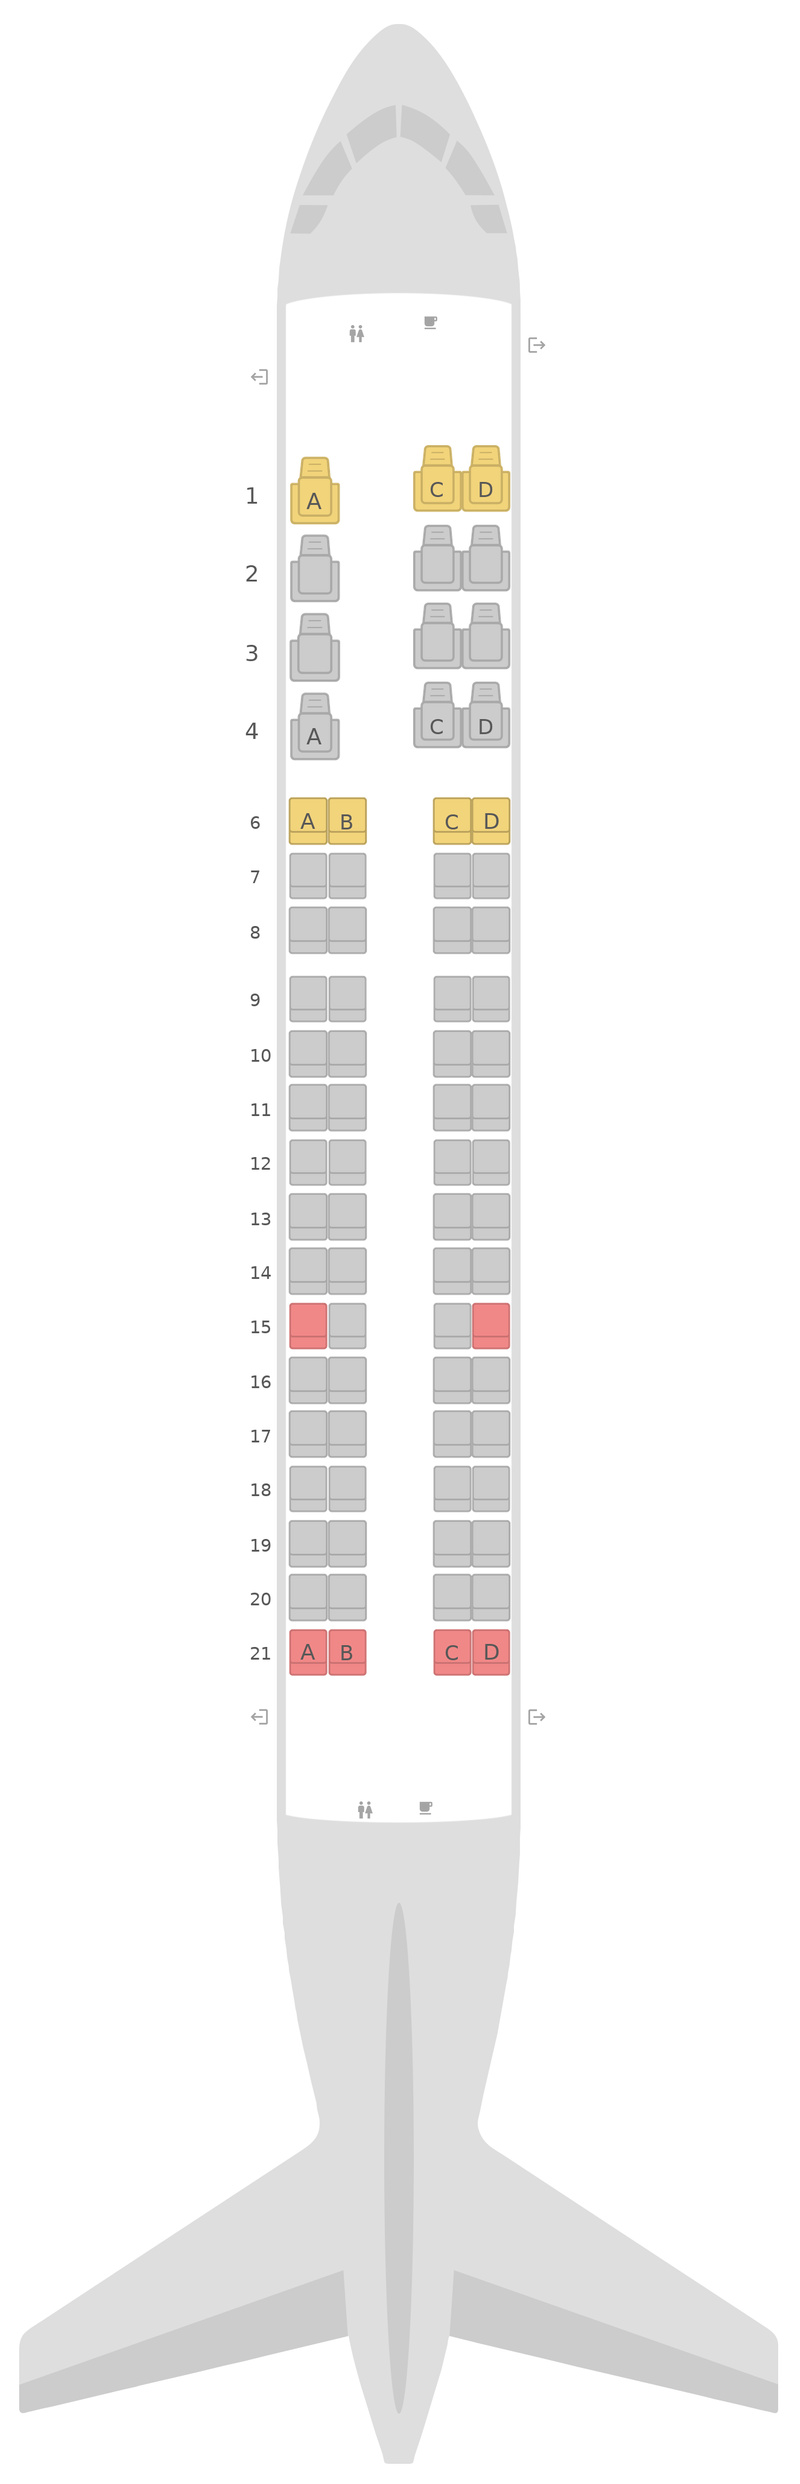 Seat Map Alaska Airlines Embraer E175 (E75)